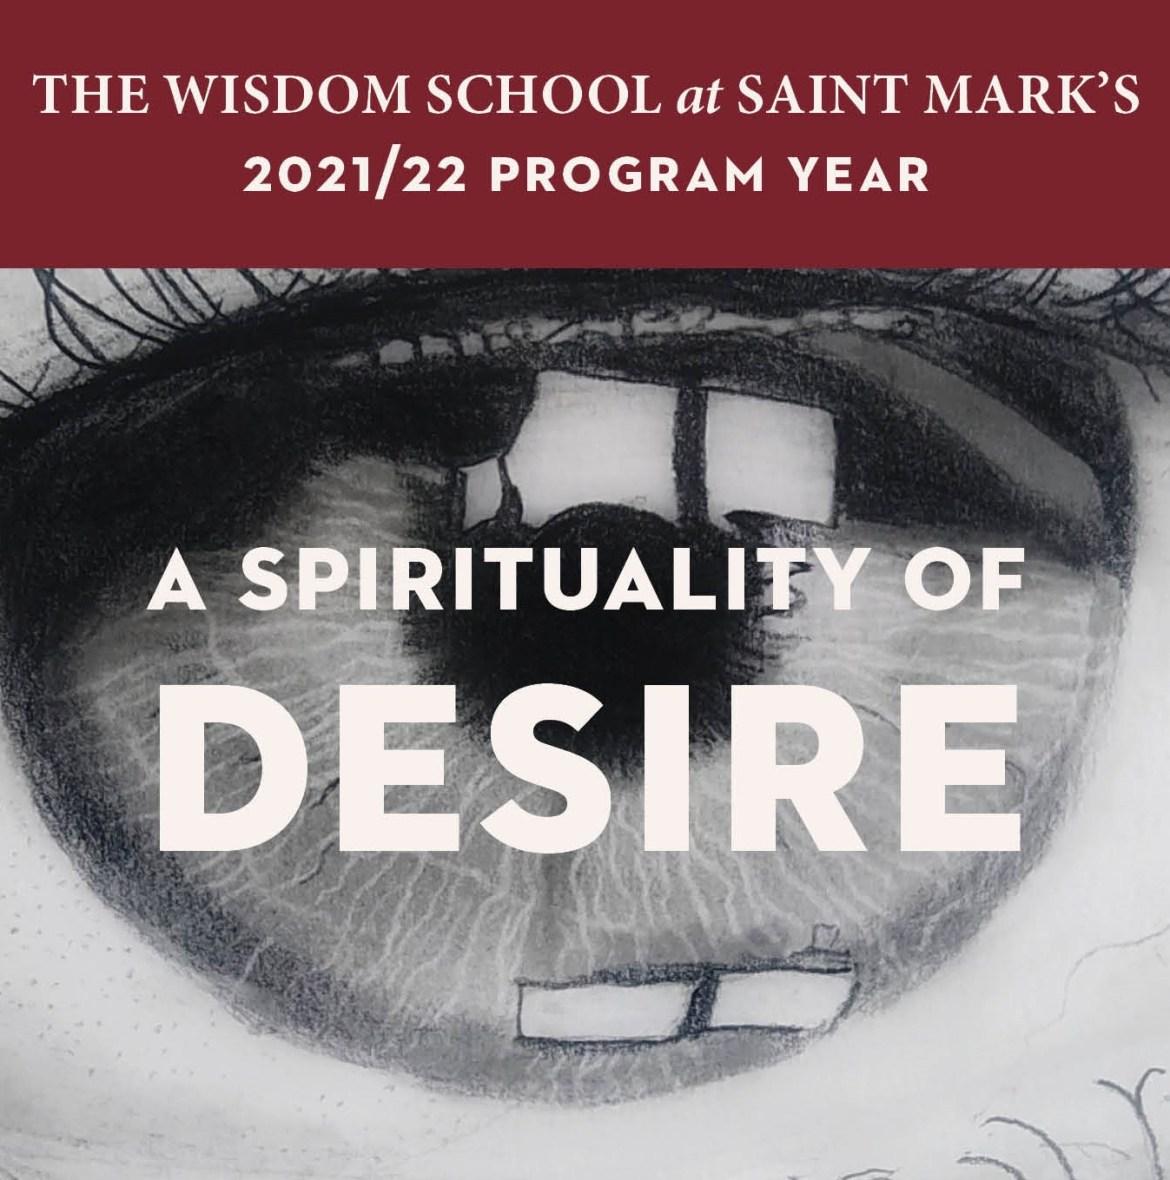 Wisdom School 21/22 Opening Plenary: A Spirituality of Desire